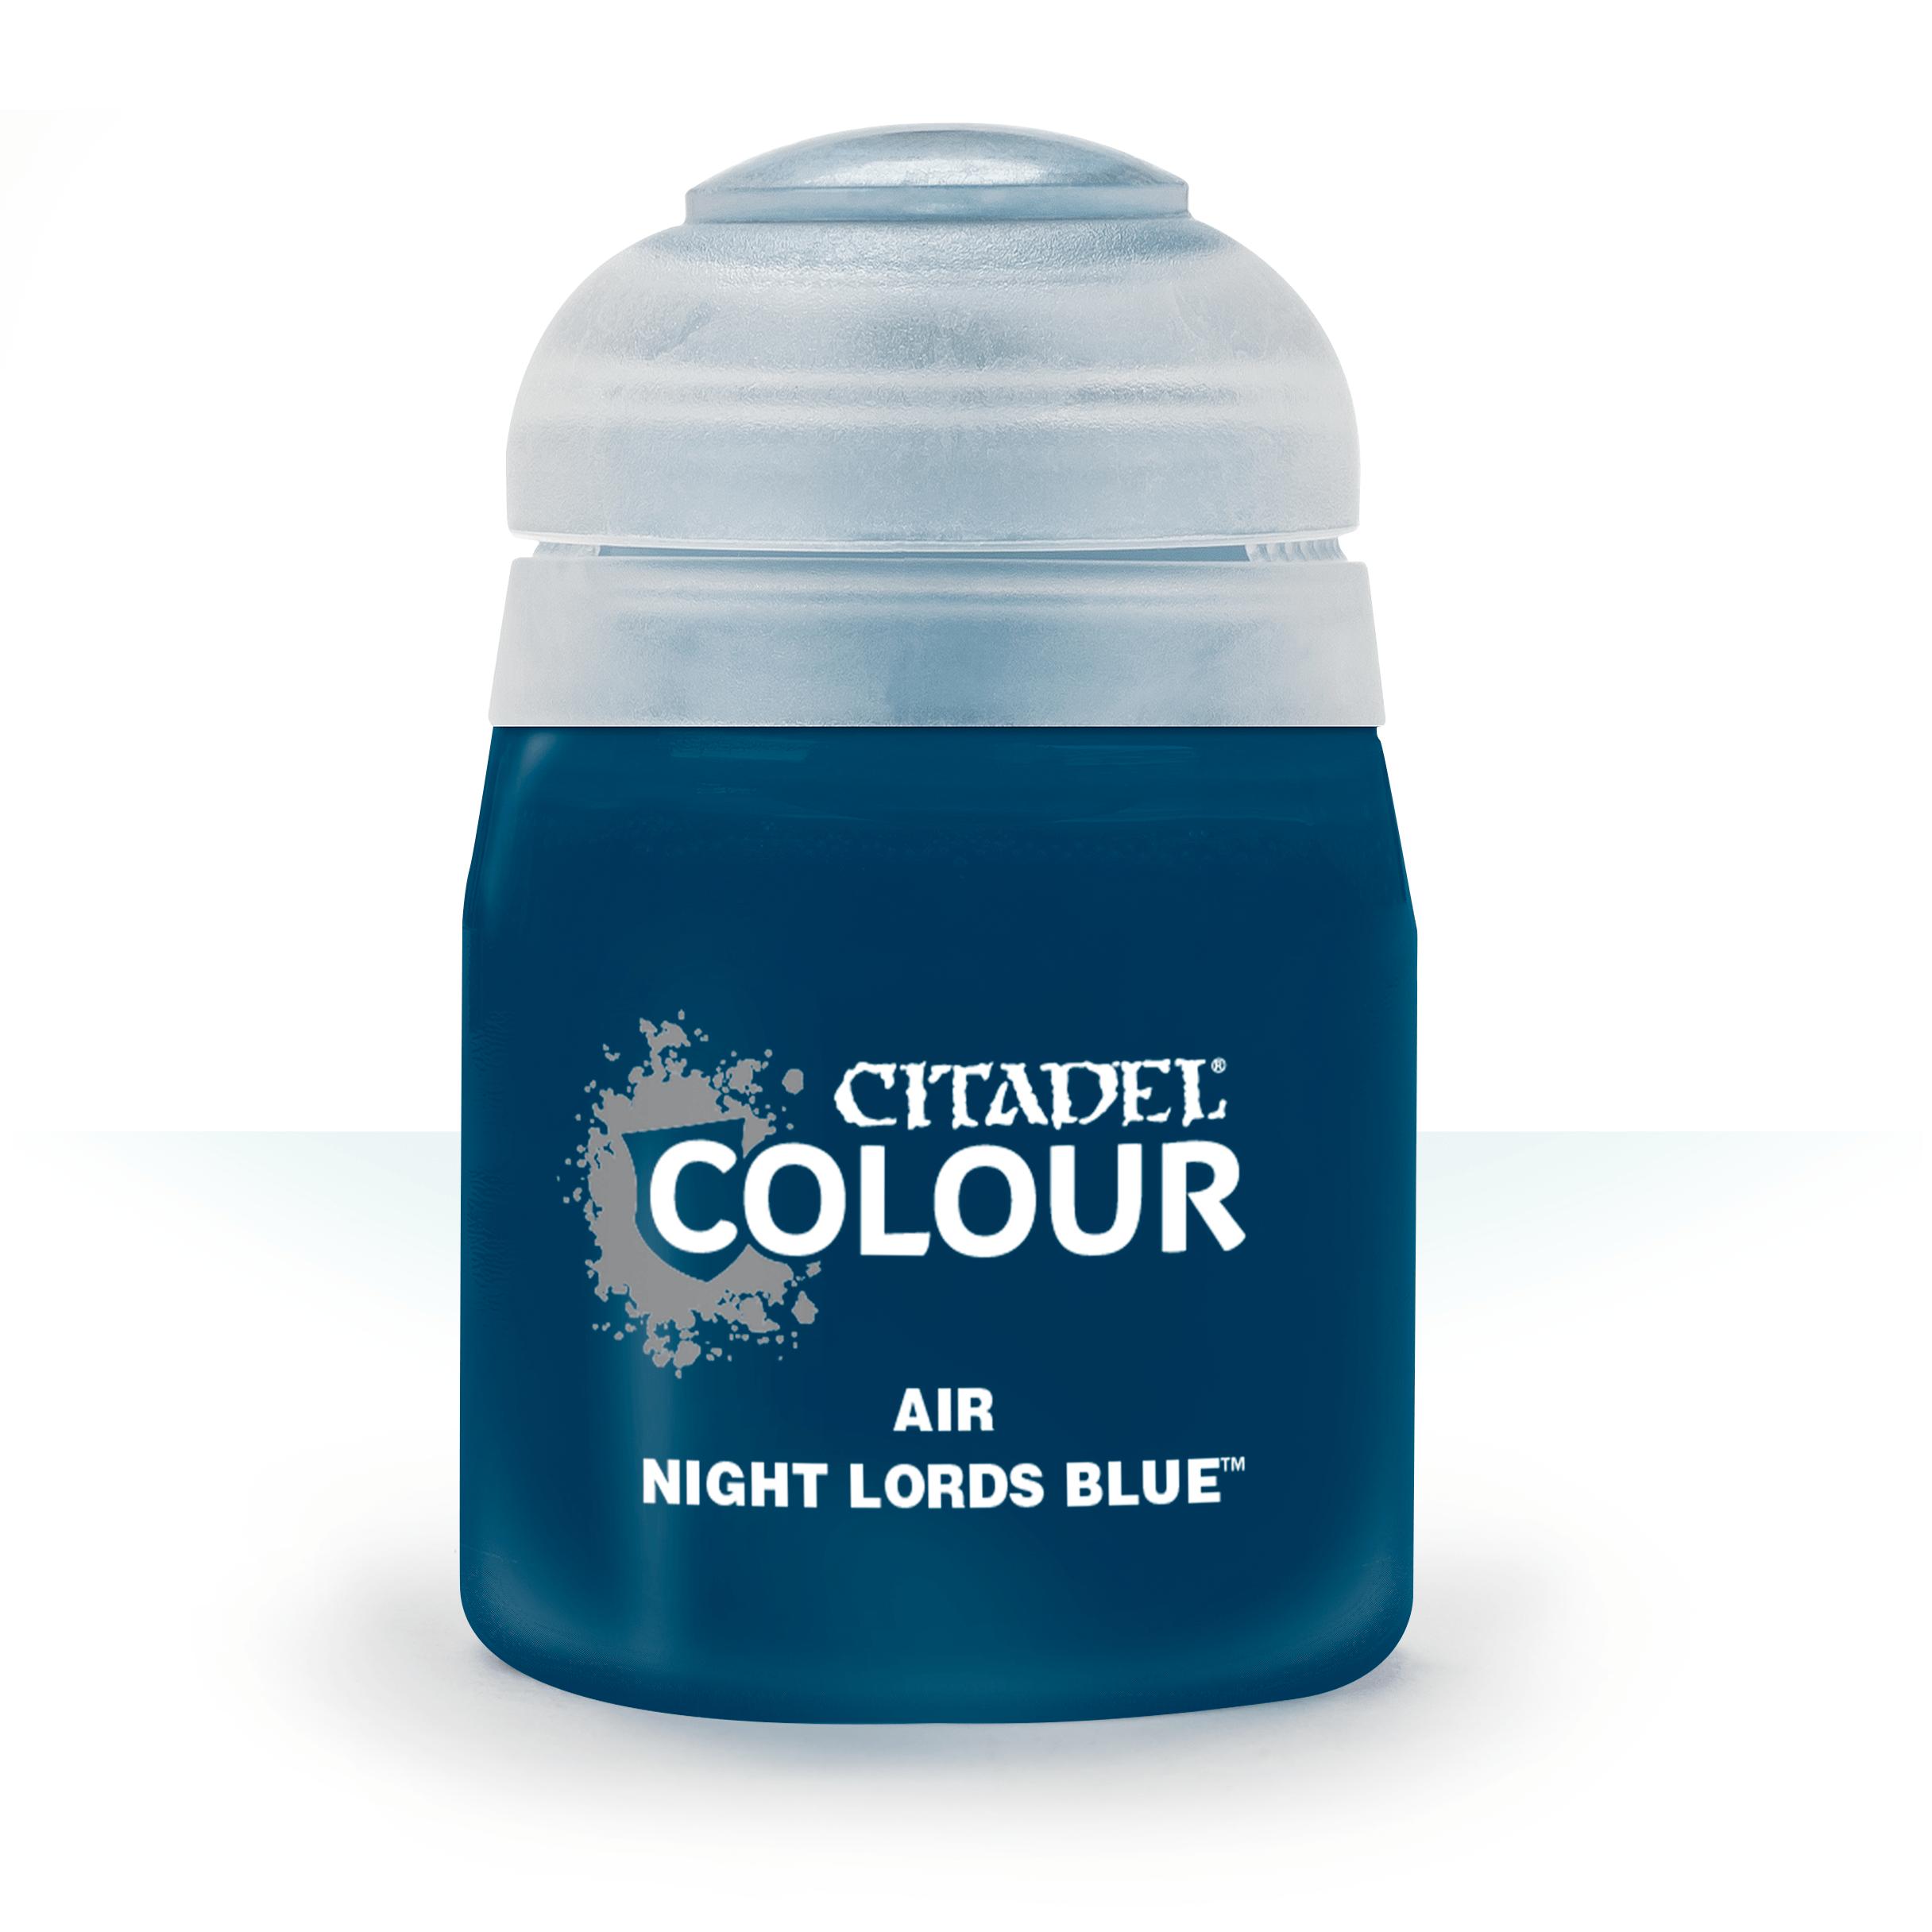 Nightlords Blue, Citadel Air 24ml